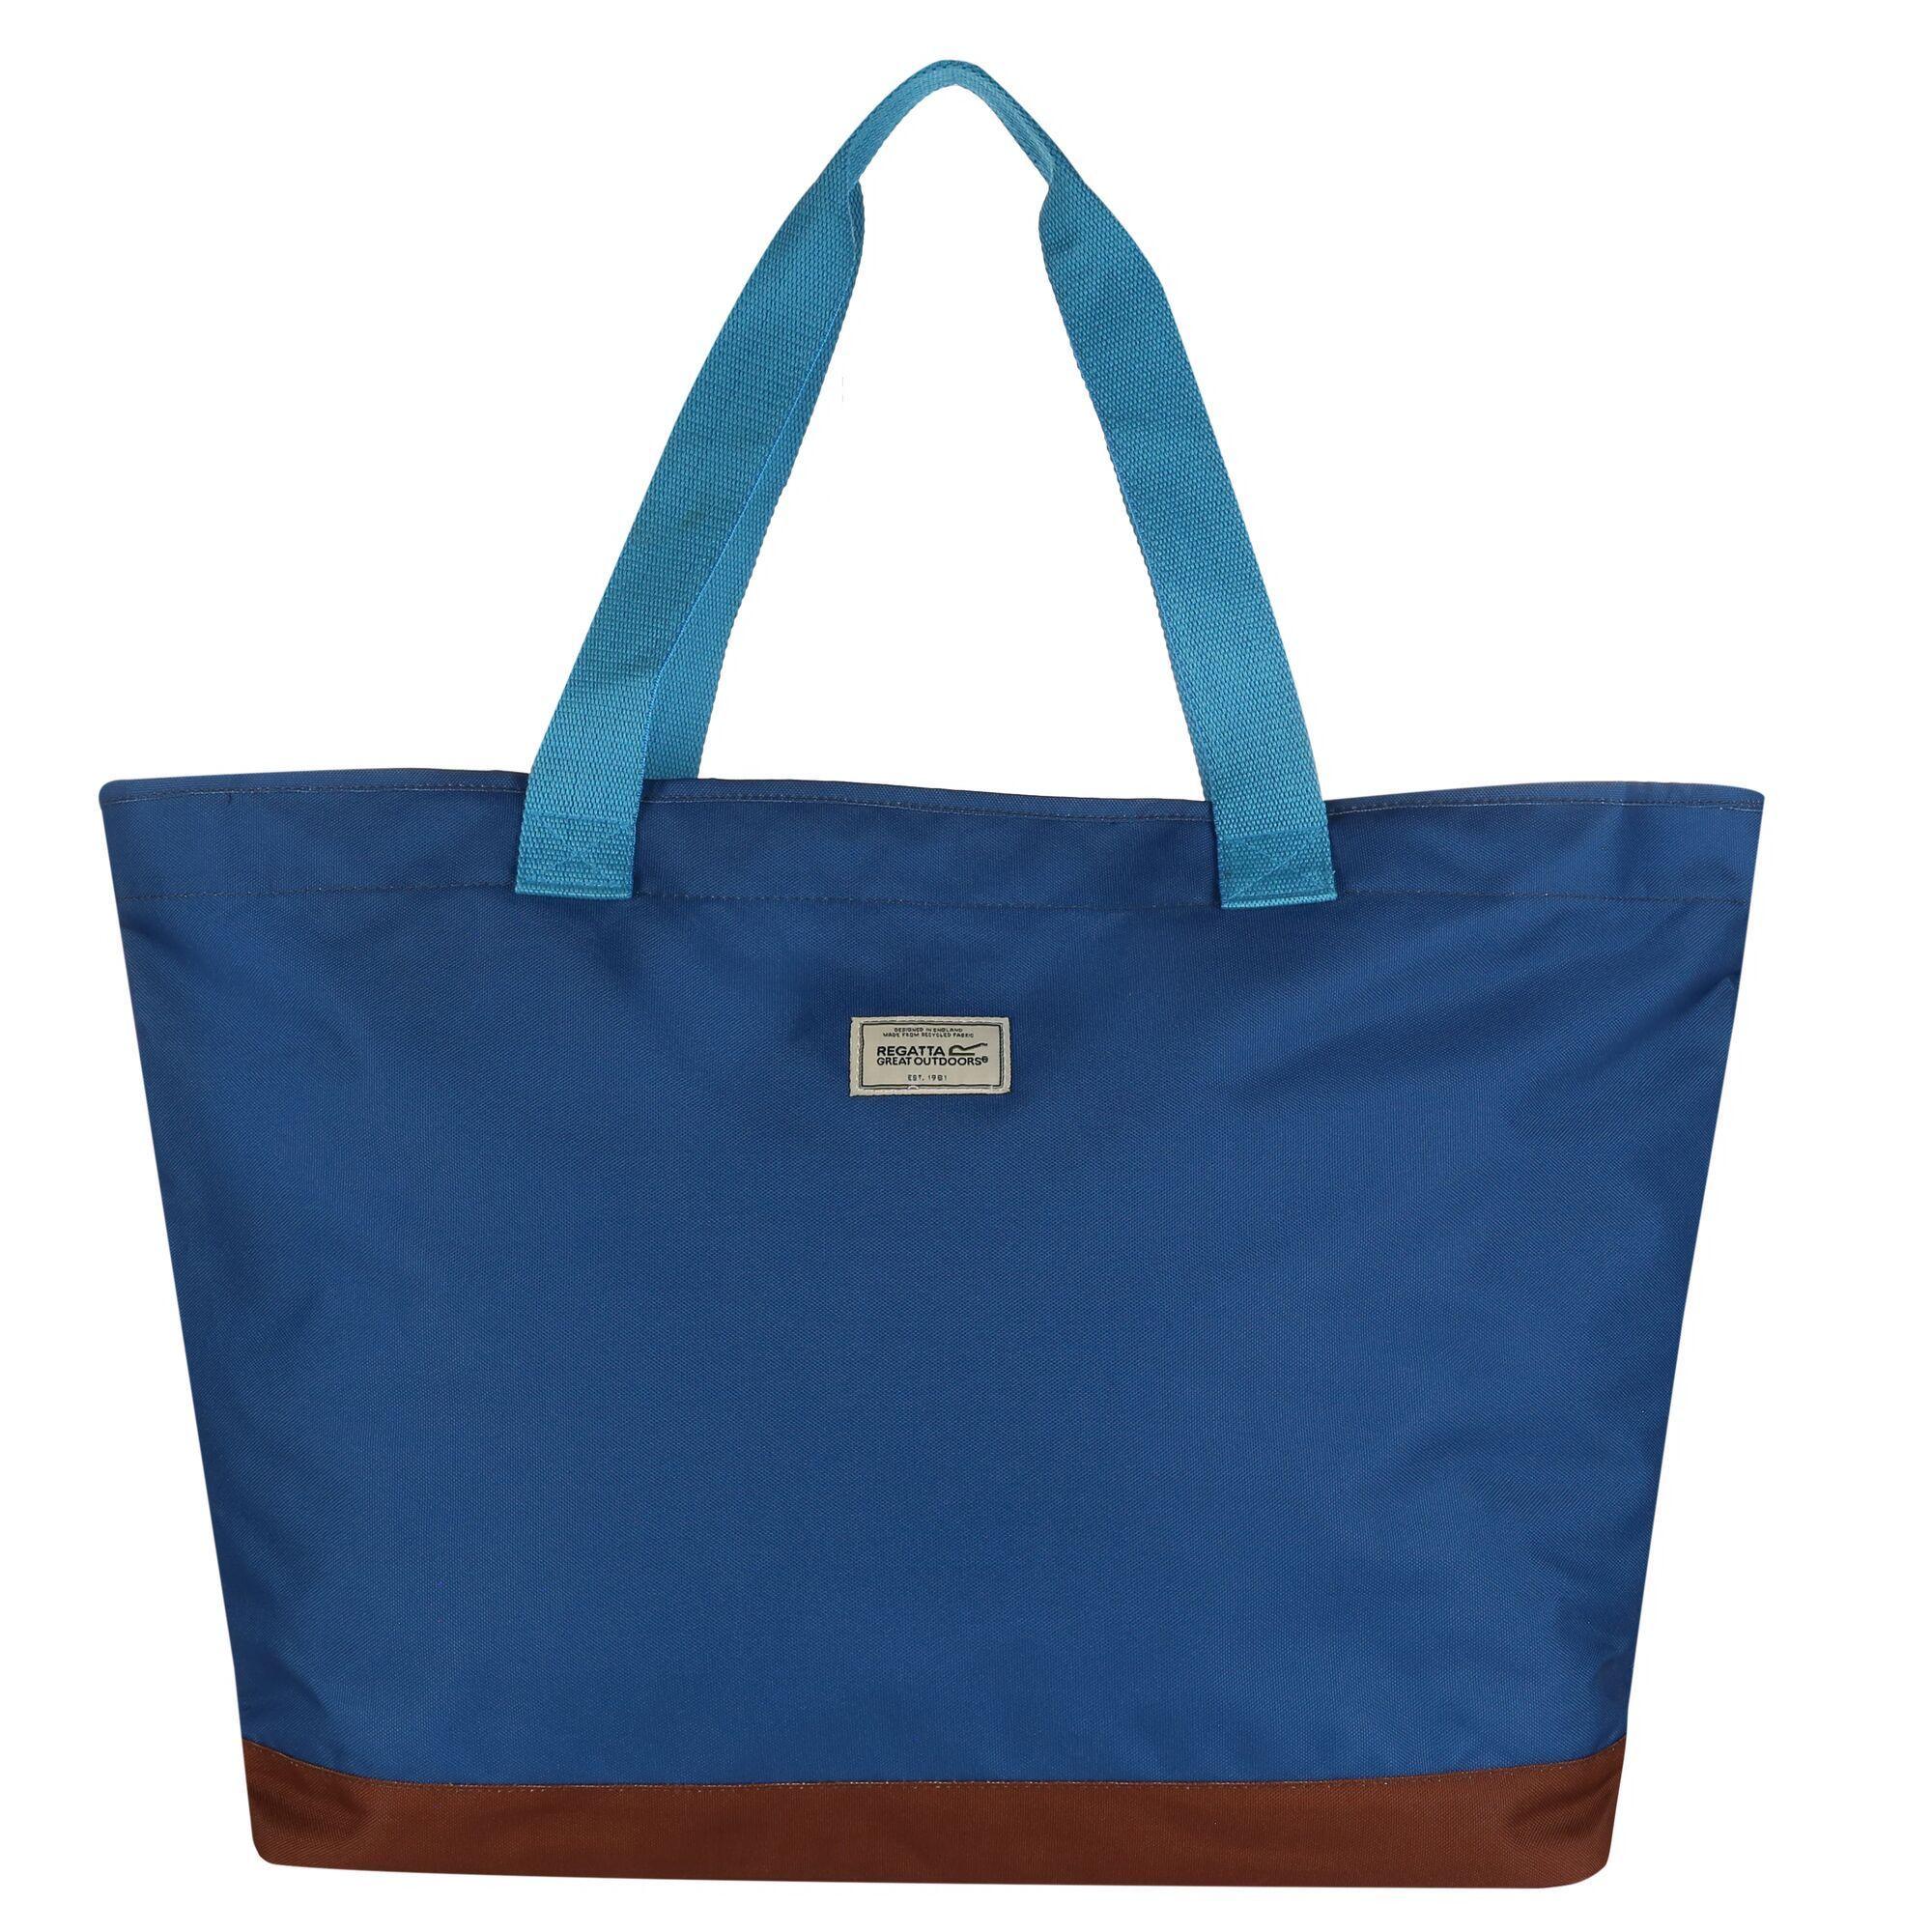 Regatta Stamford Beach Tote Bag (Stellar Blue/Maui Blue)